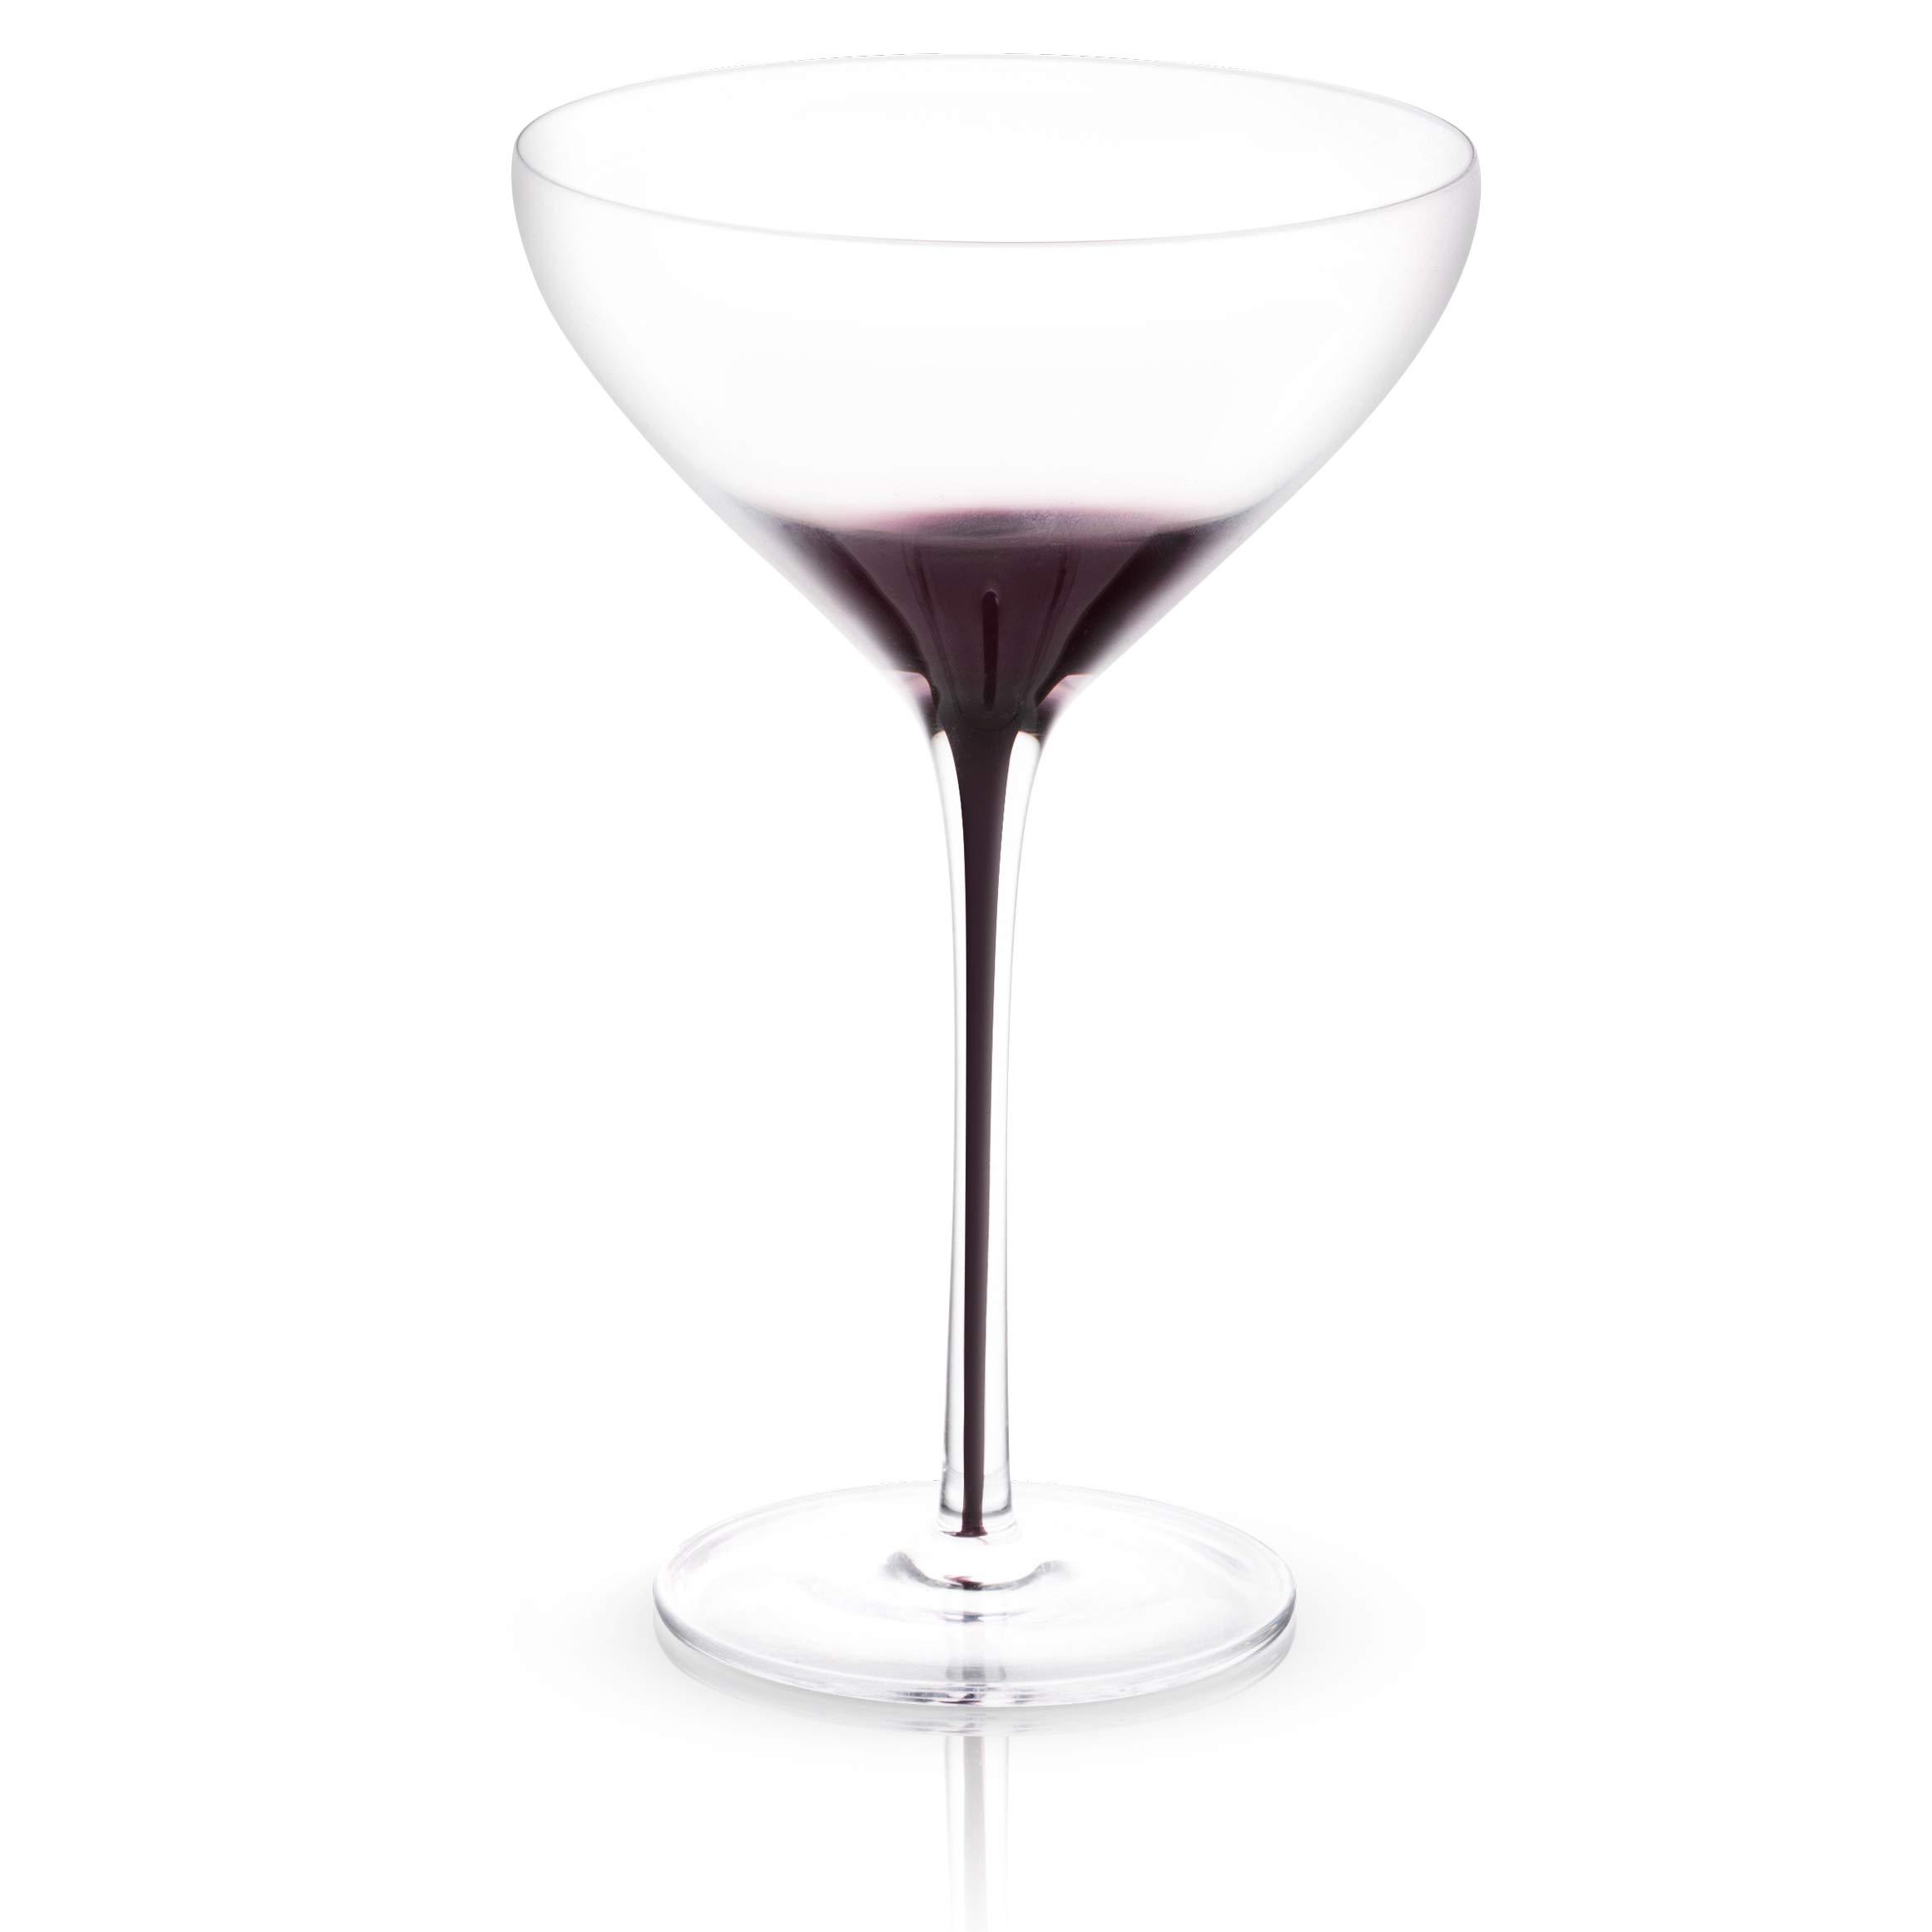 JoyJolt Black Swan Stemmed Martini Glasses, Premium Lead Free Crystal Glassware, 10.5 Oz Capacity, Set Of 2 by JoyJolt (Image #2)